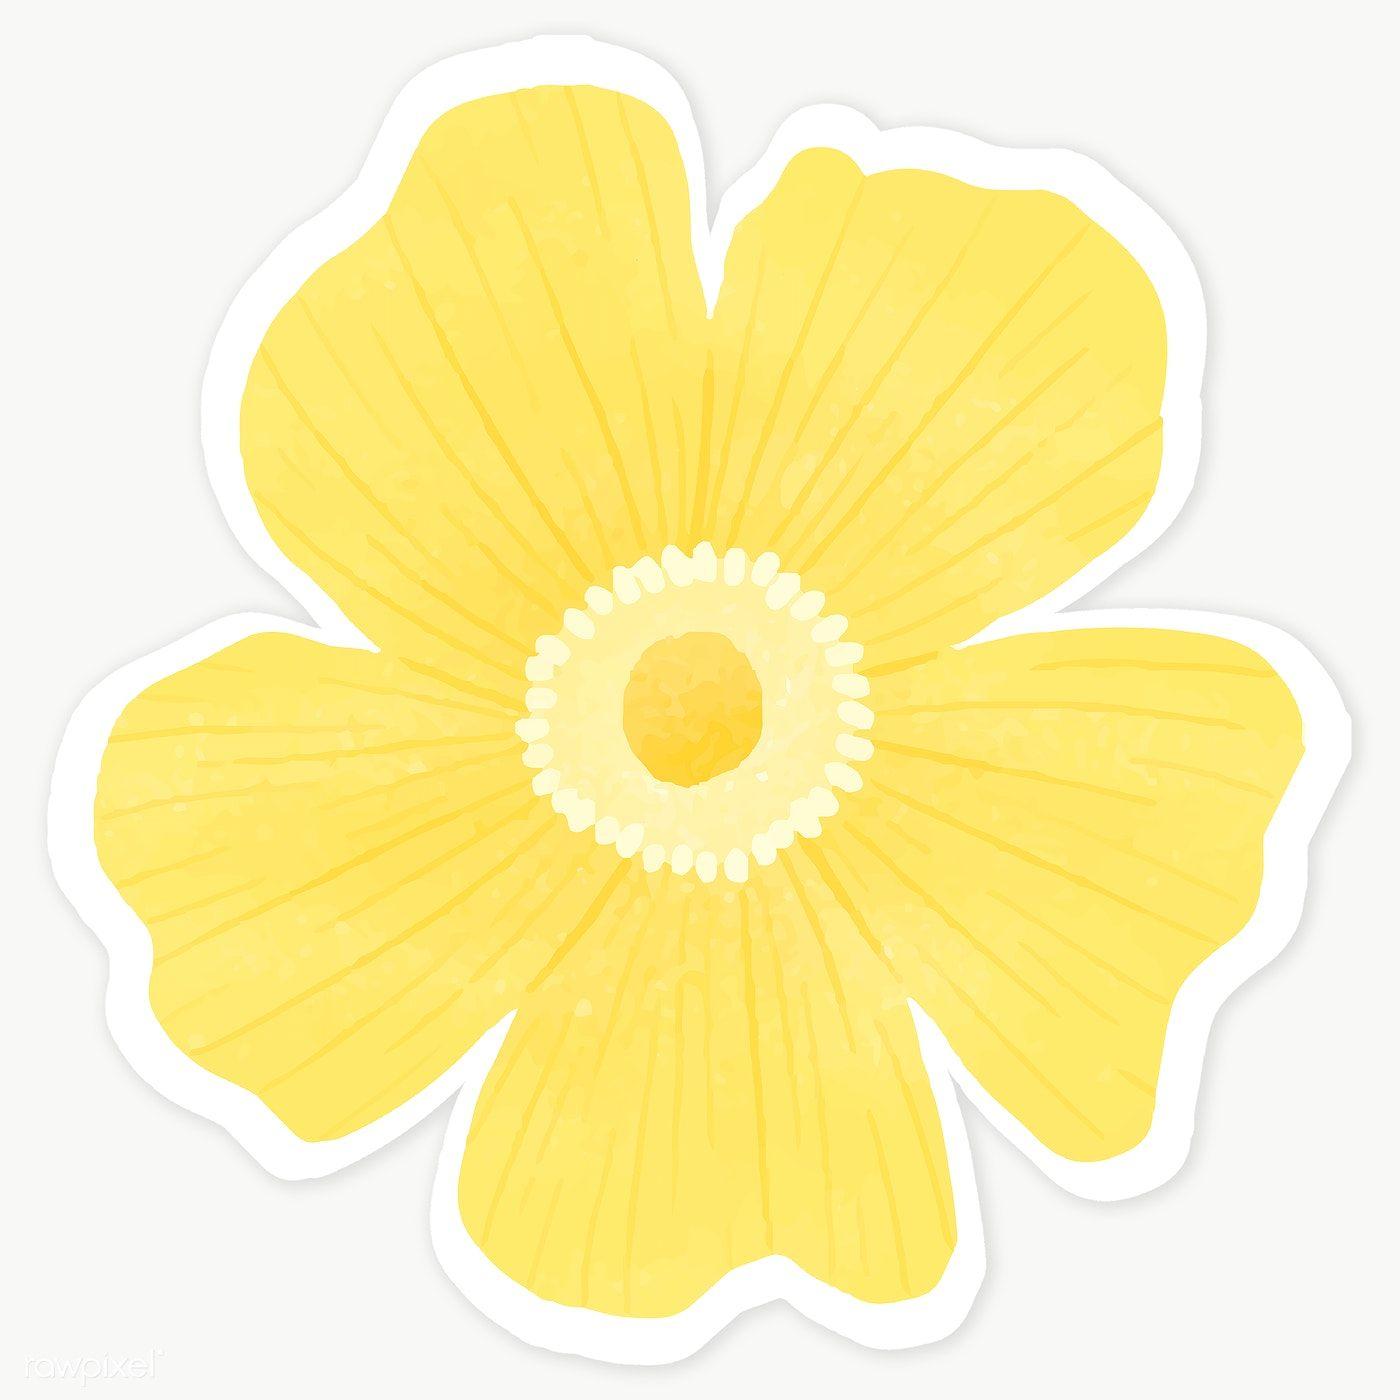 Yellow Flower Sticker Transparent Png Premium Image By Rawpixel Com Katie Moir Warna Bunga Stiker